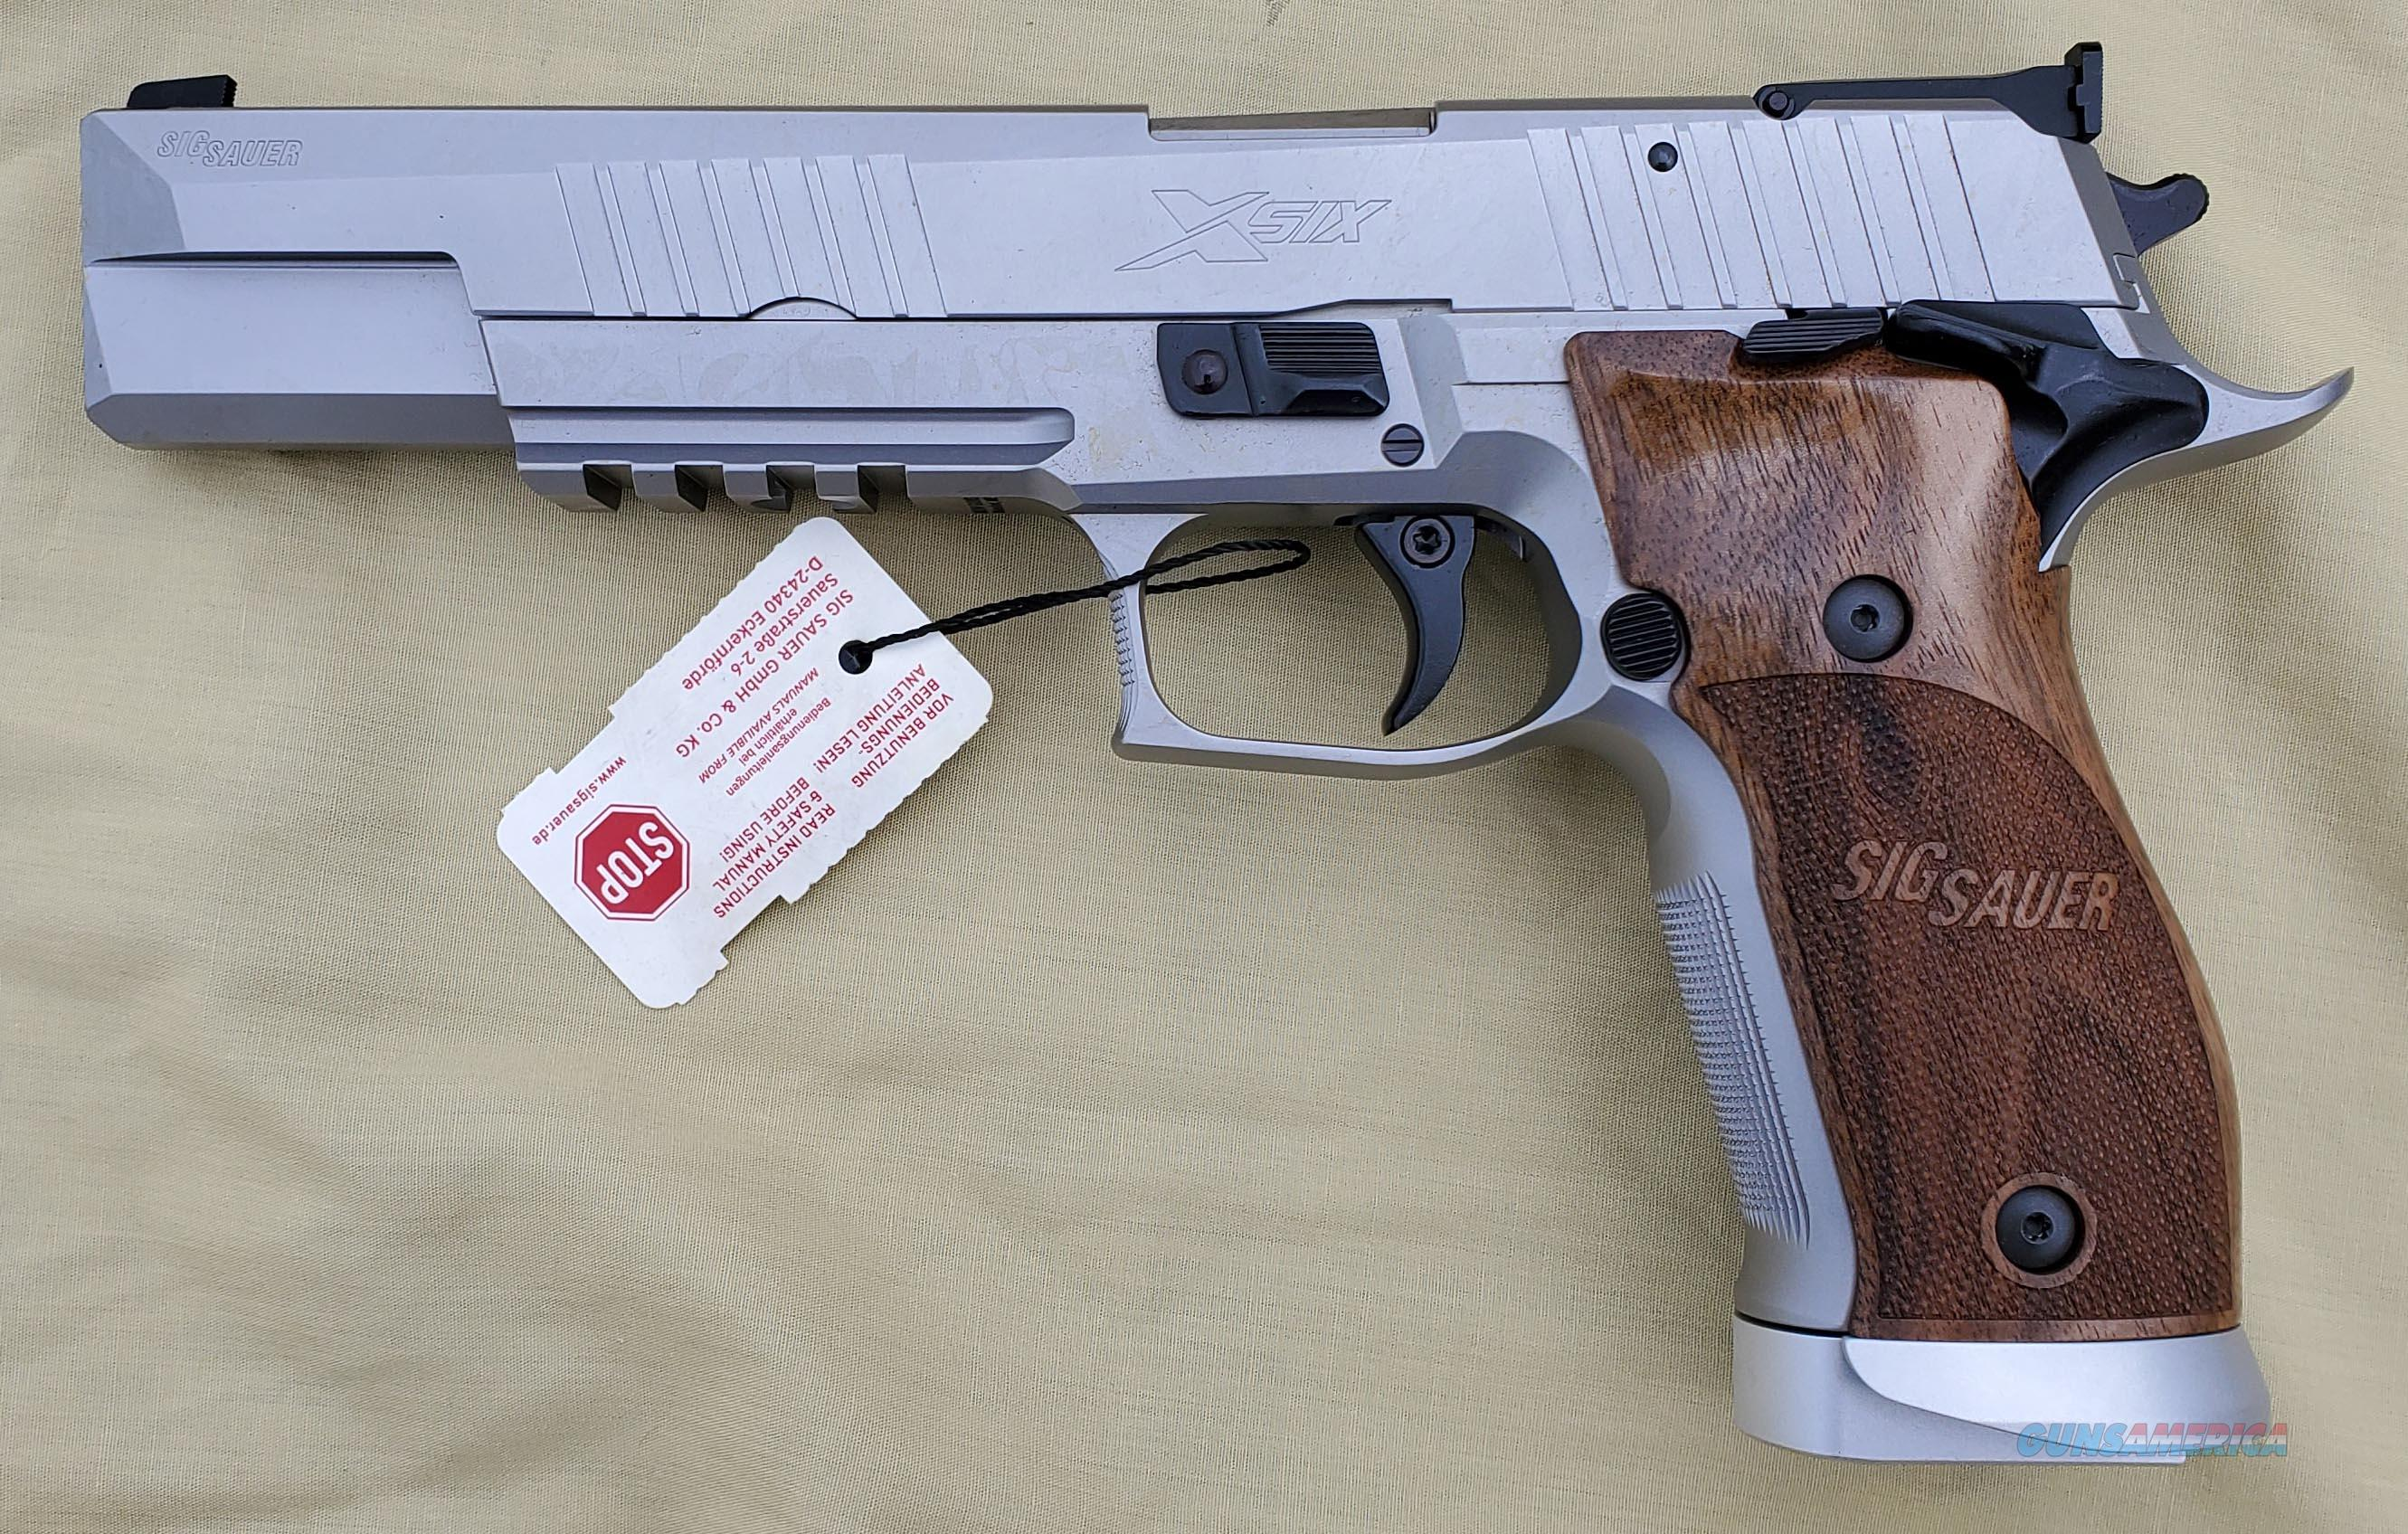 WTS P226 X6 Classic  Guns > Pistols > Sig - Sauer/Sigarms Pistols > P226